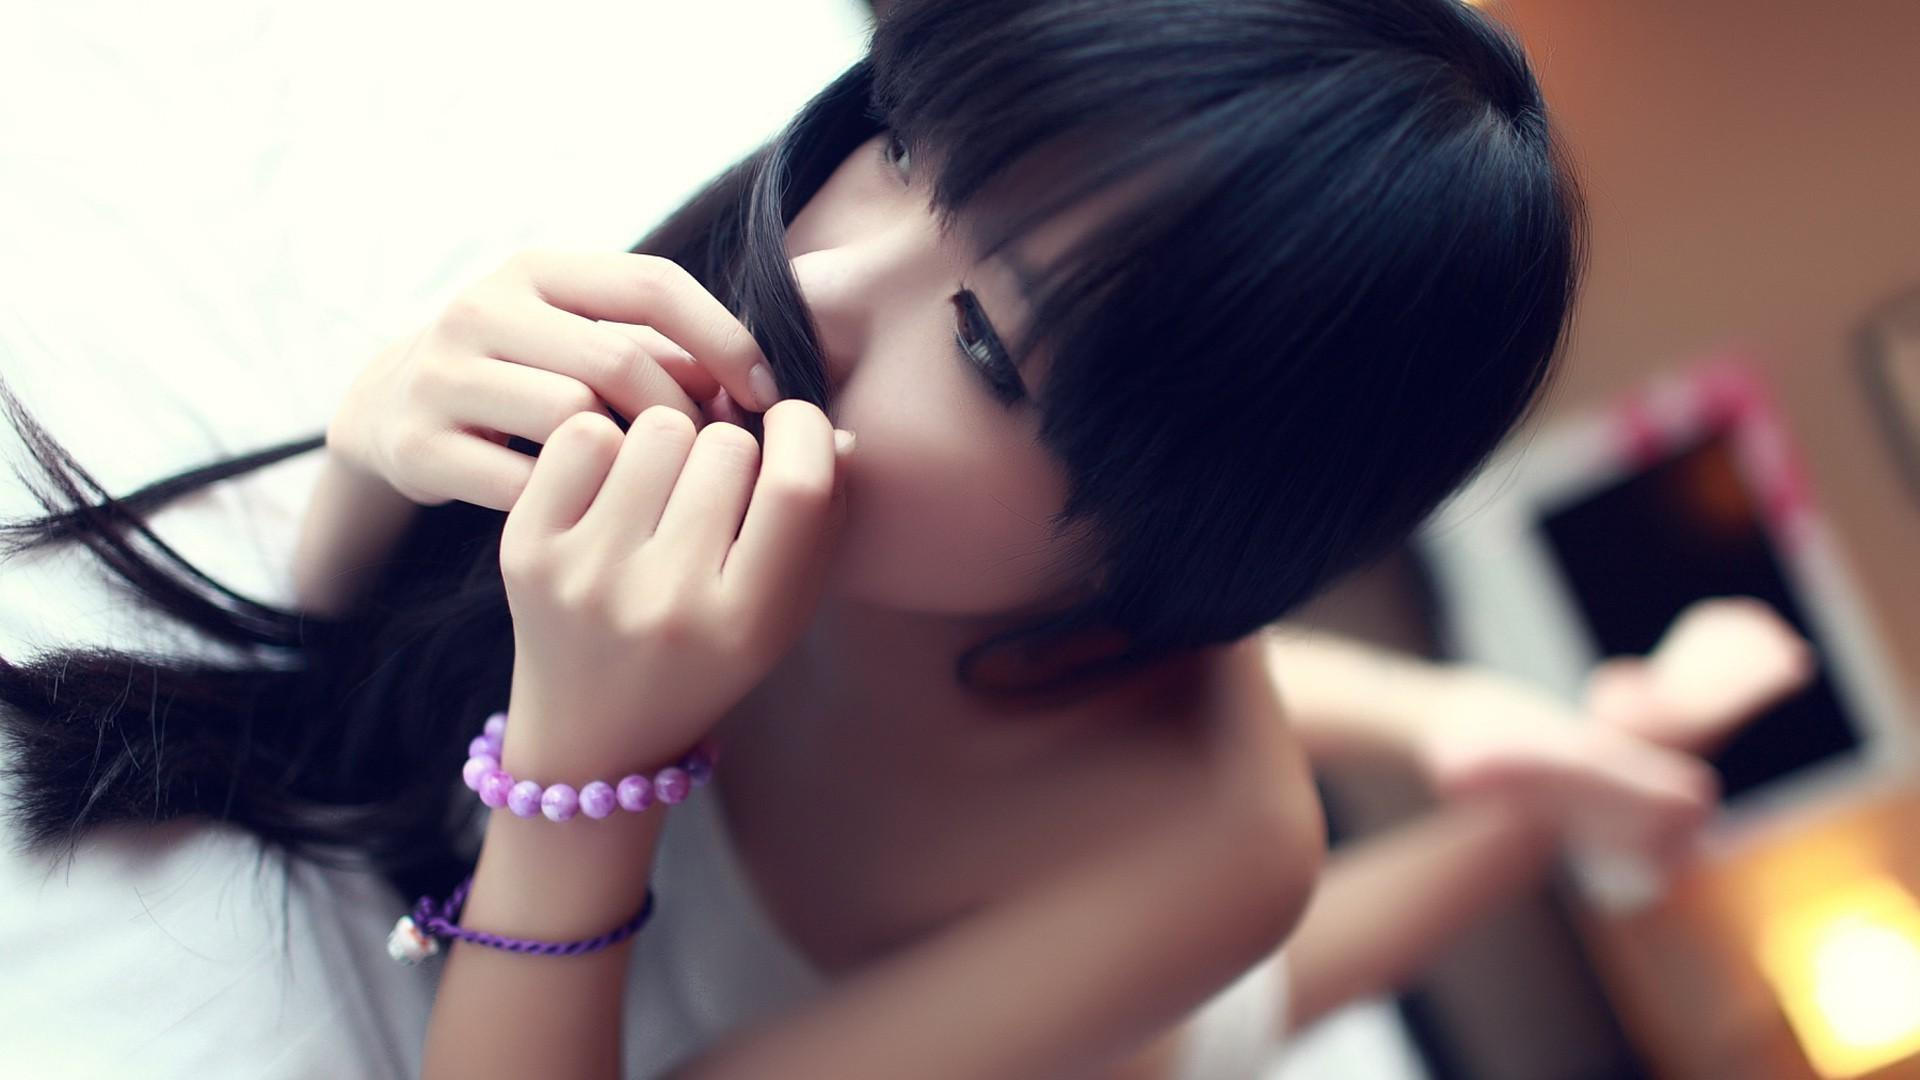 People 1920x1080 Asian women bangs bracelets hands women indoors looking away indoors makeup lying on front dark hair dark eyes model